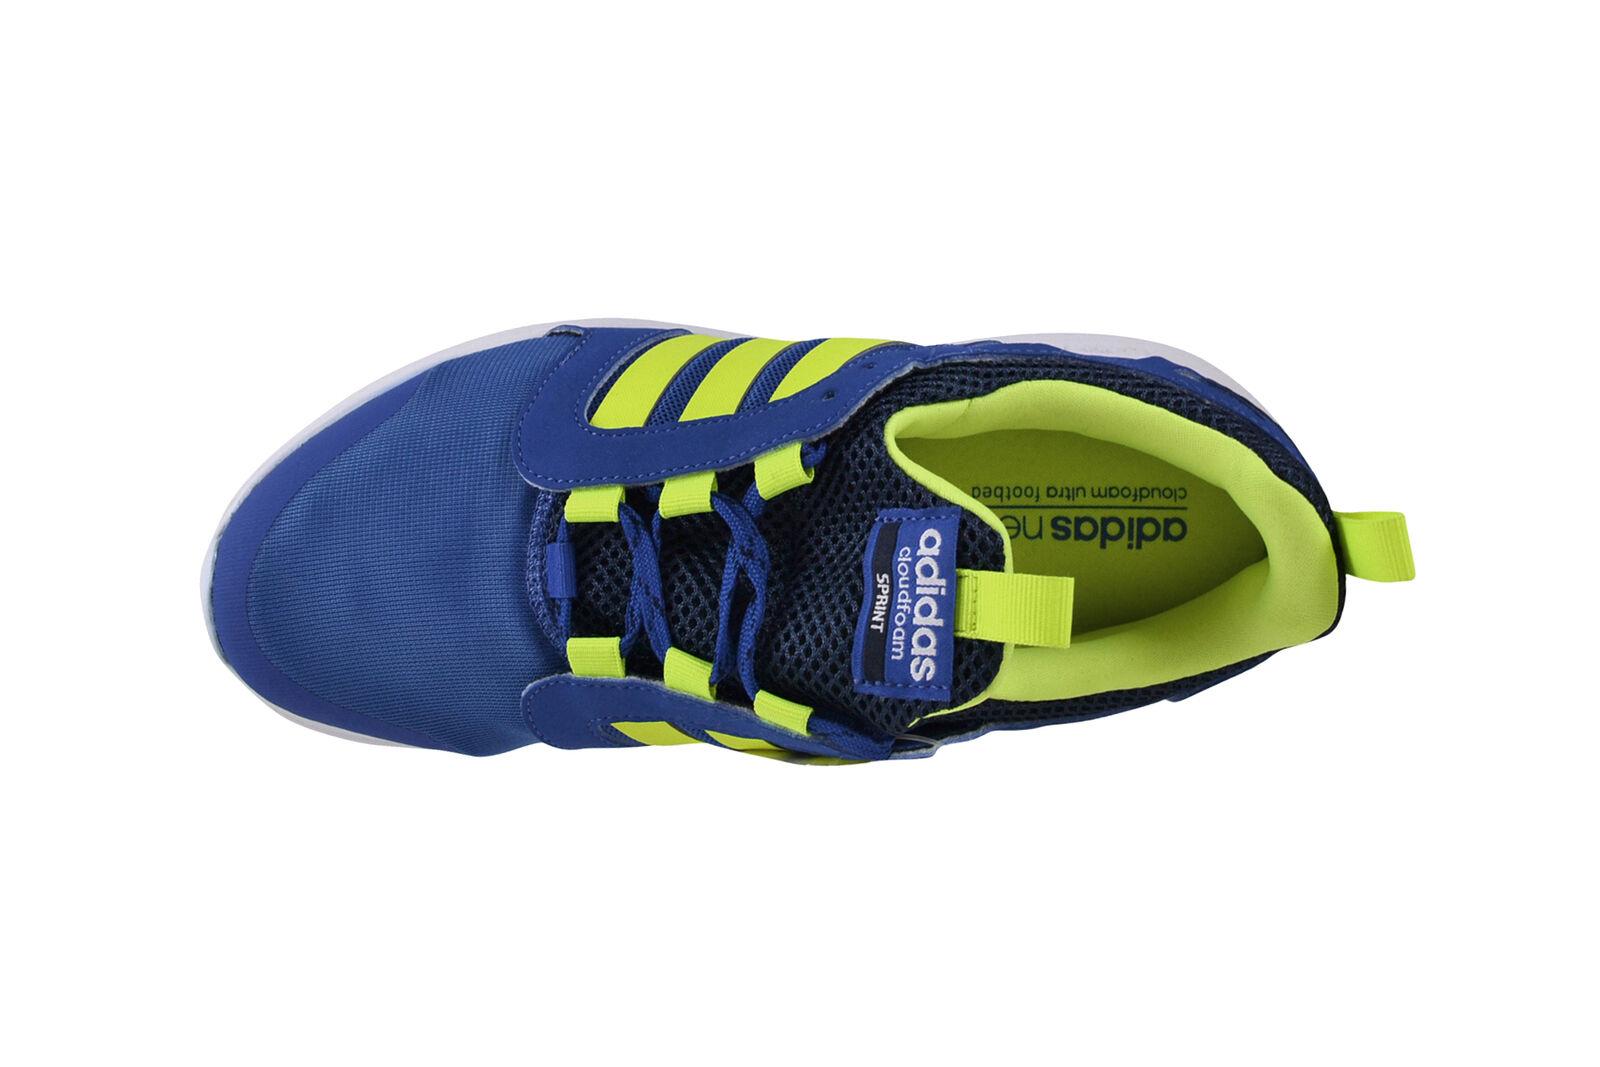 Adidas Neo Neo Neo Cloudfoam Sprint Blau sGelb conavy Turnschuhe Schuhe blau AQ1489 556617